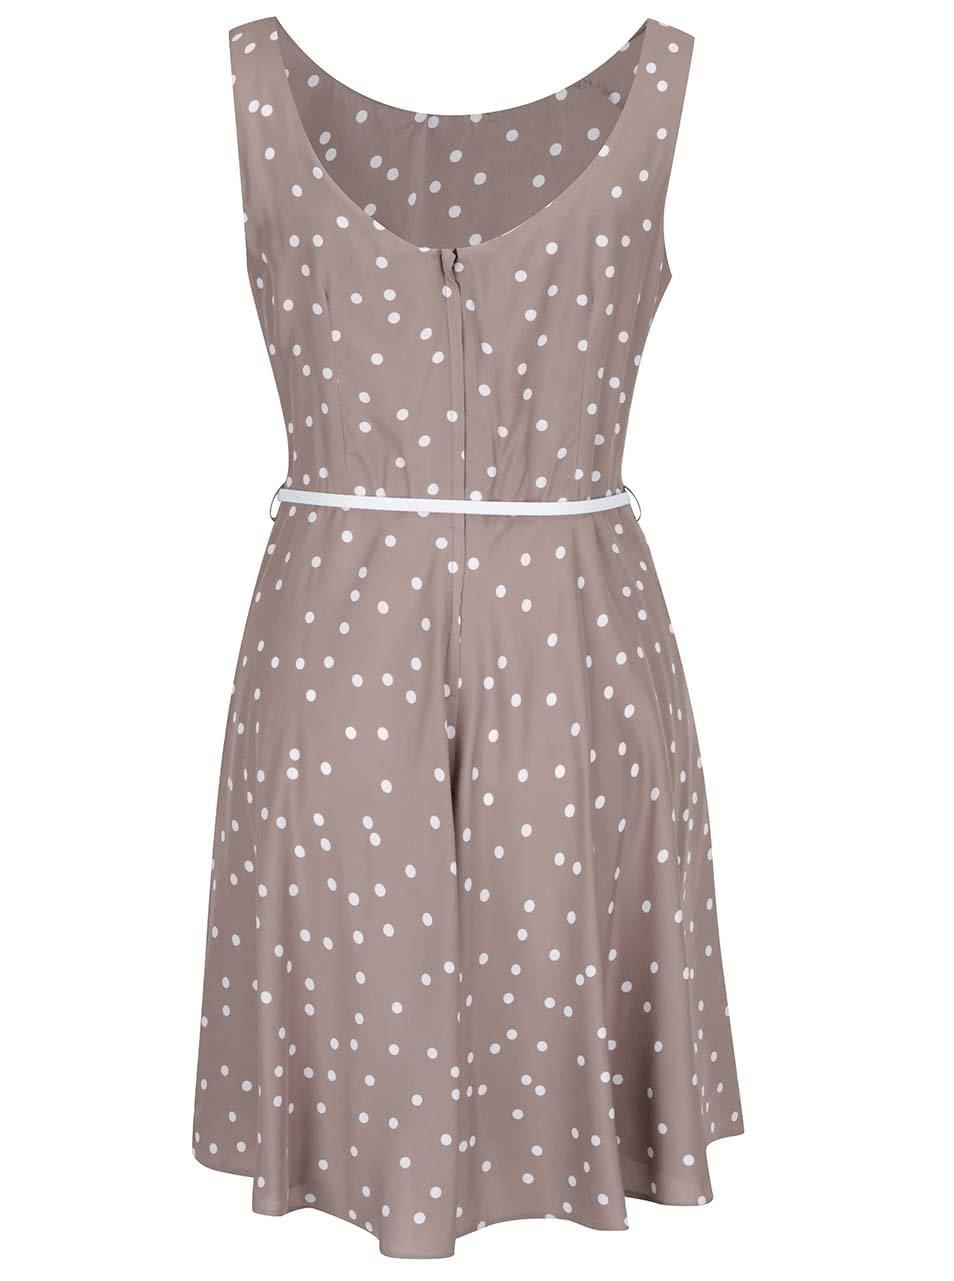 Béžové bodkované šaty s opaskom Apricot ... ec5ef6c8569